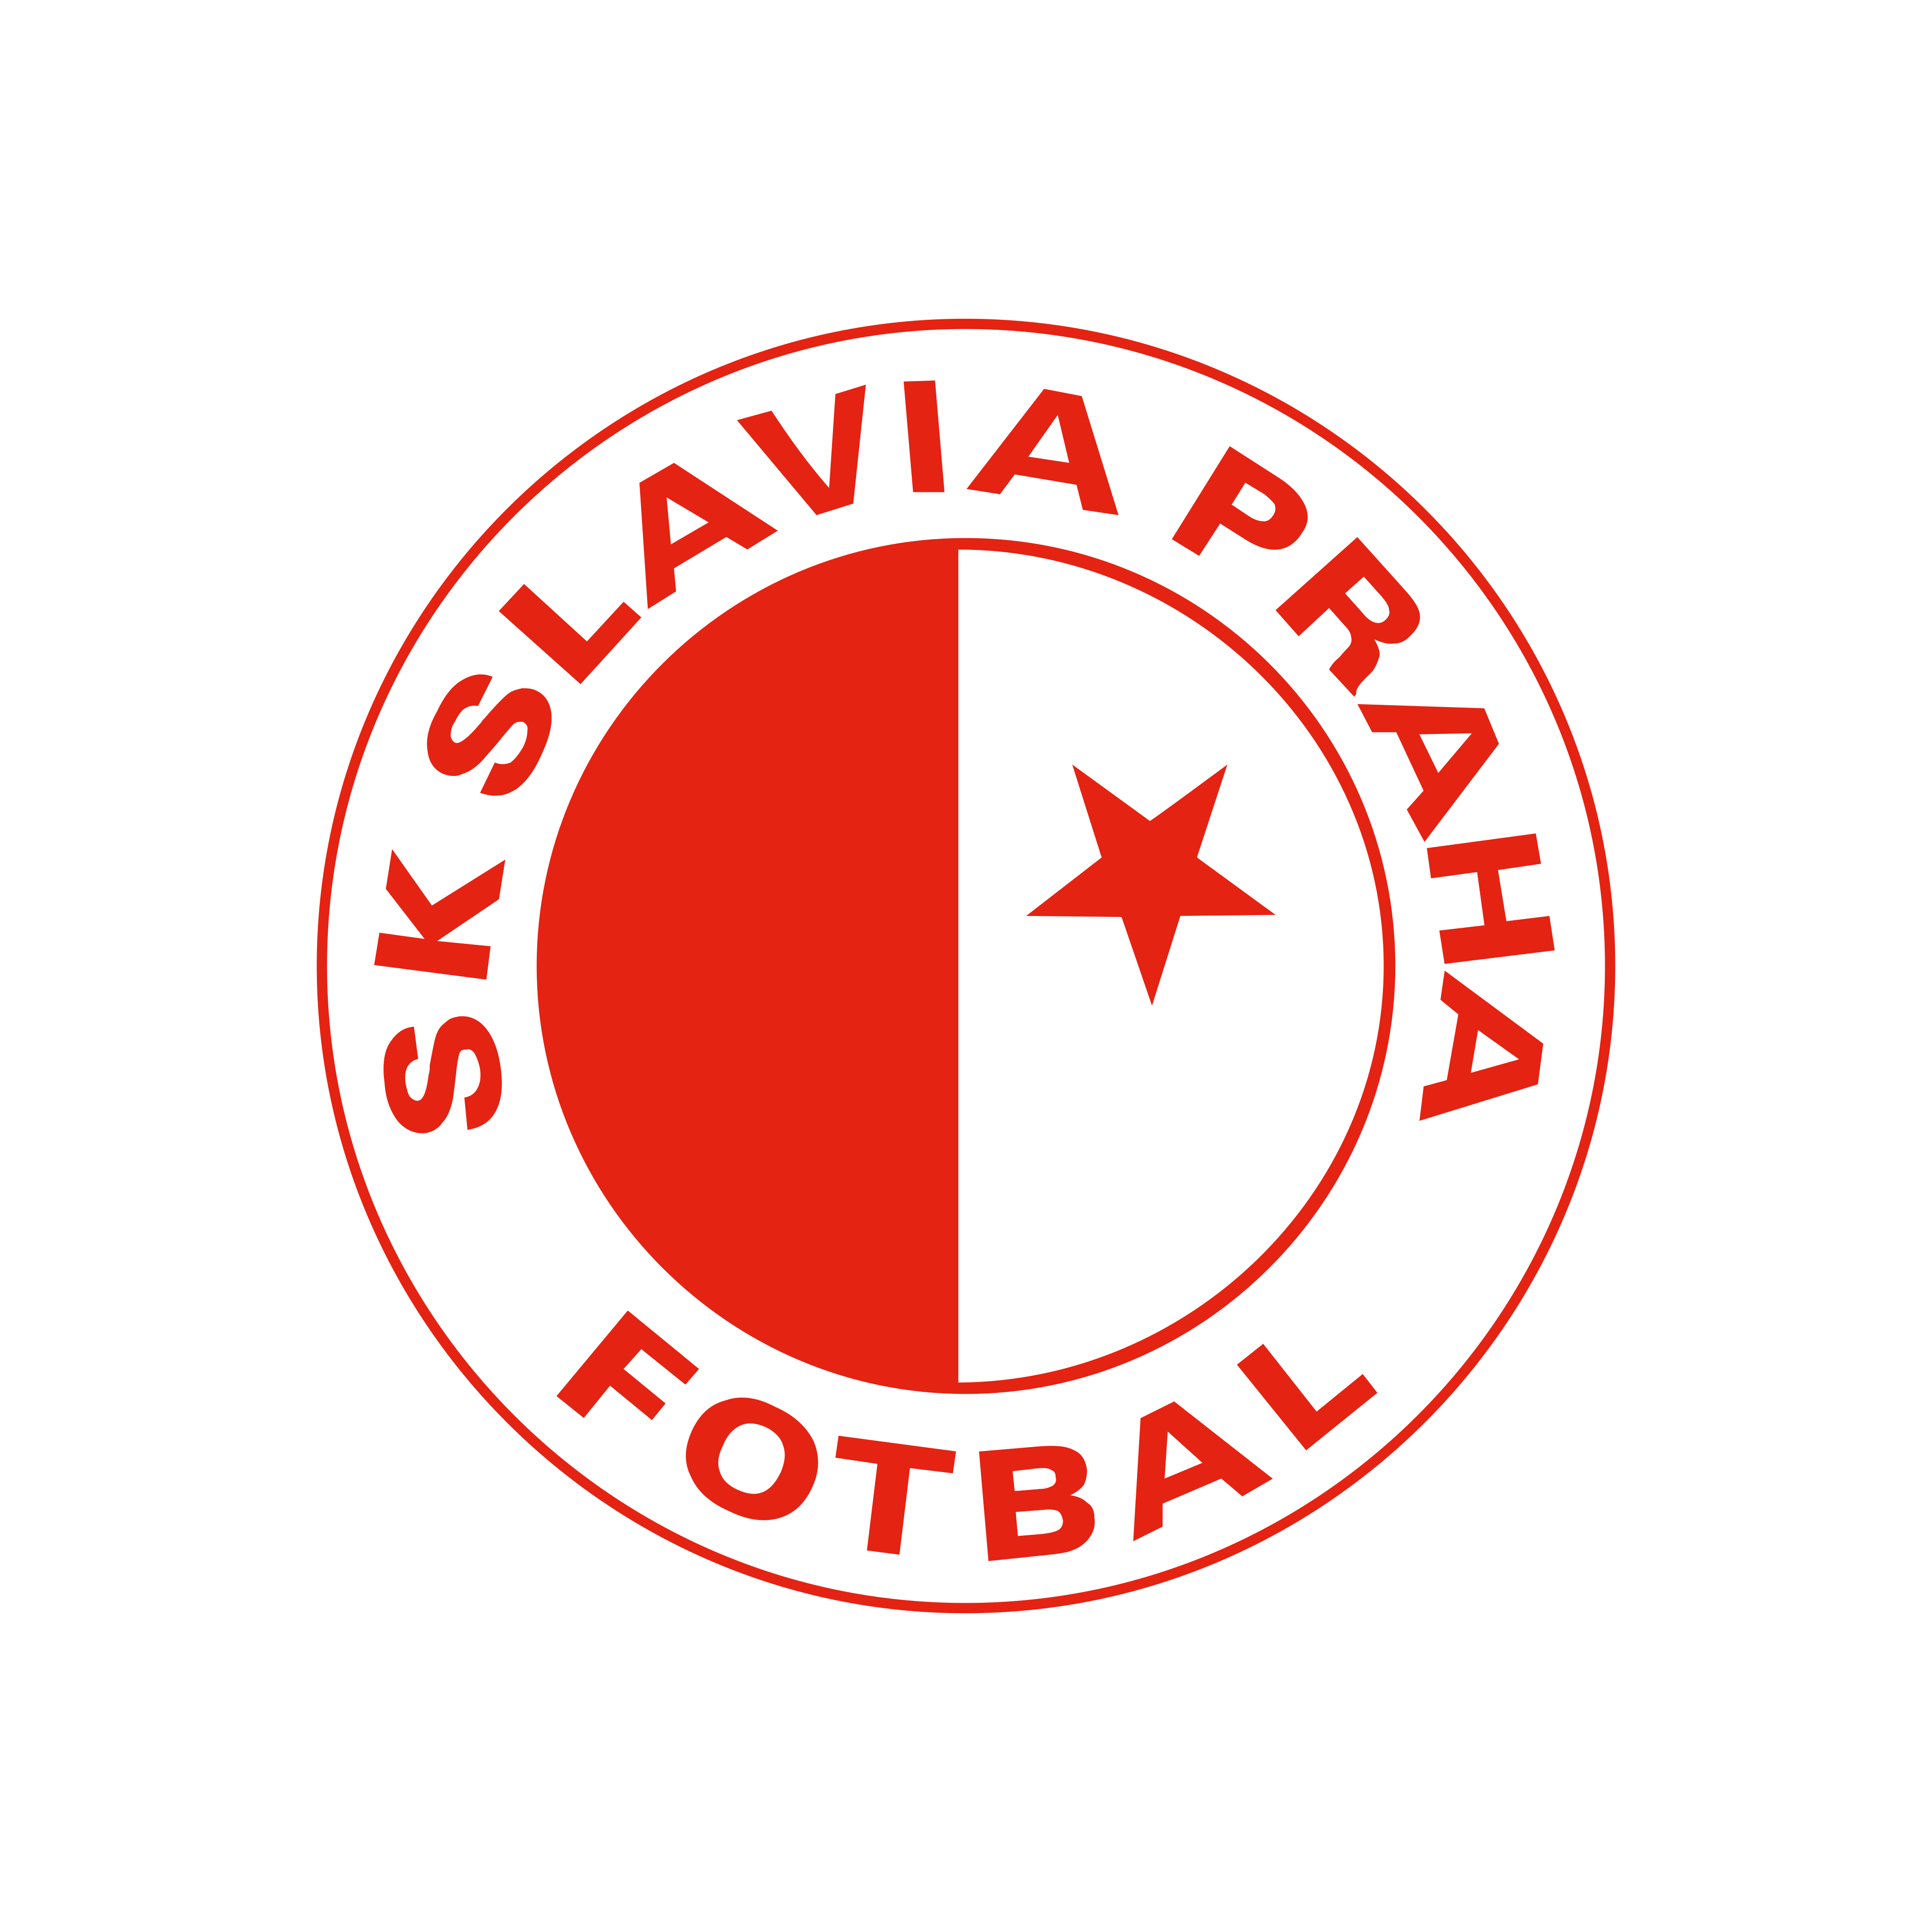 sk slavia praha logo 0 - SK Slavia Praga Logo - Escudo